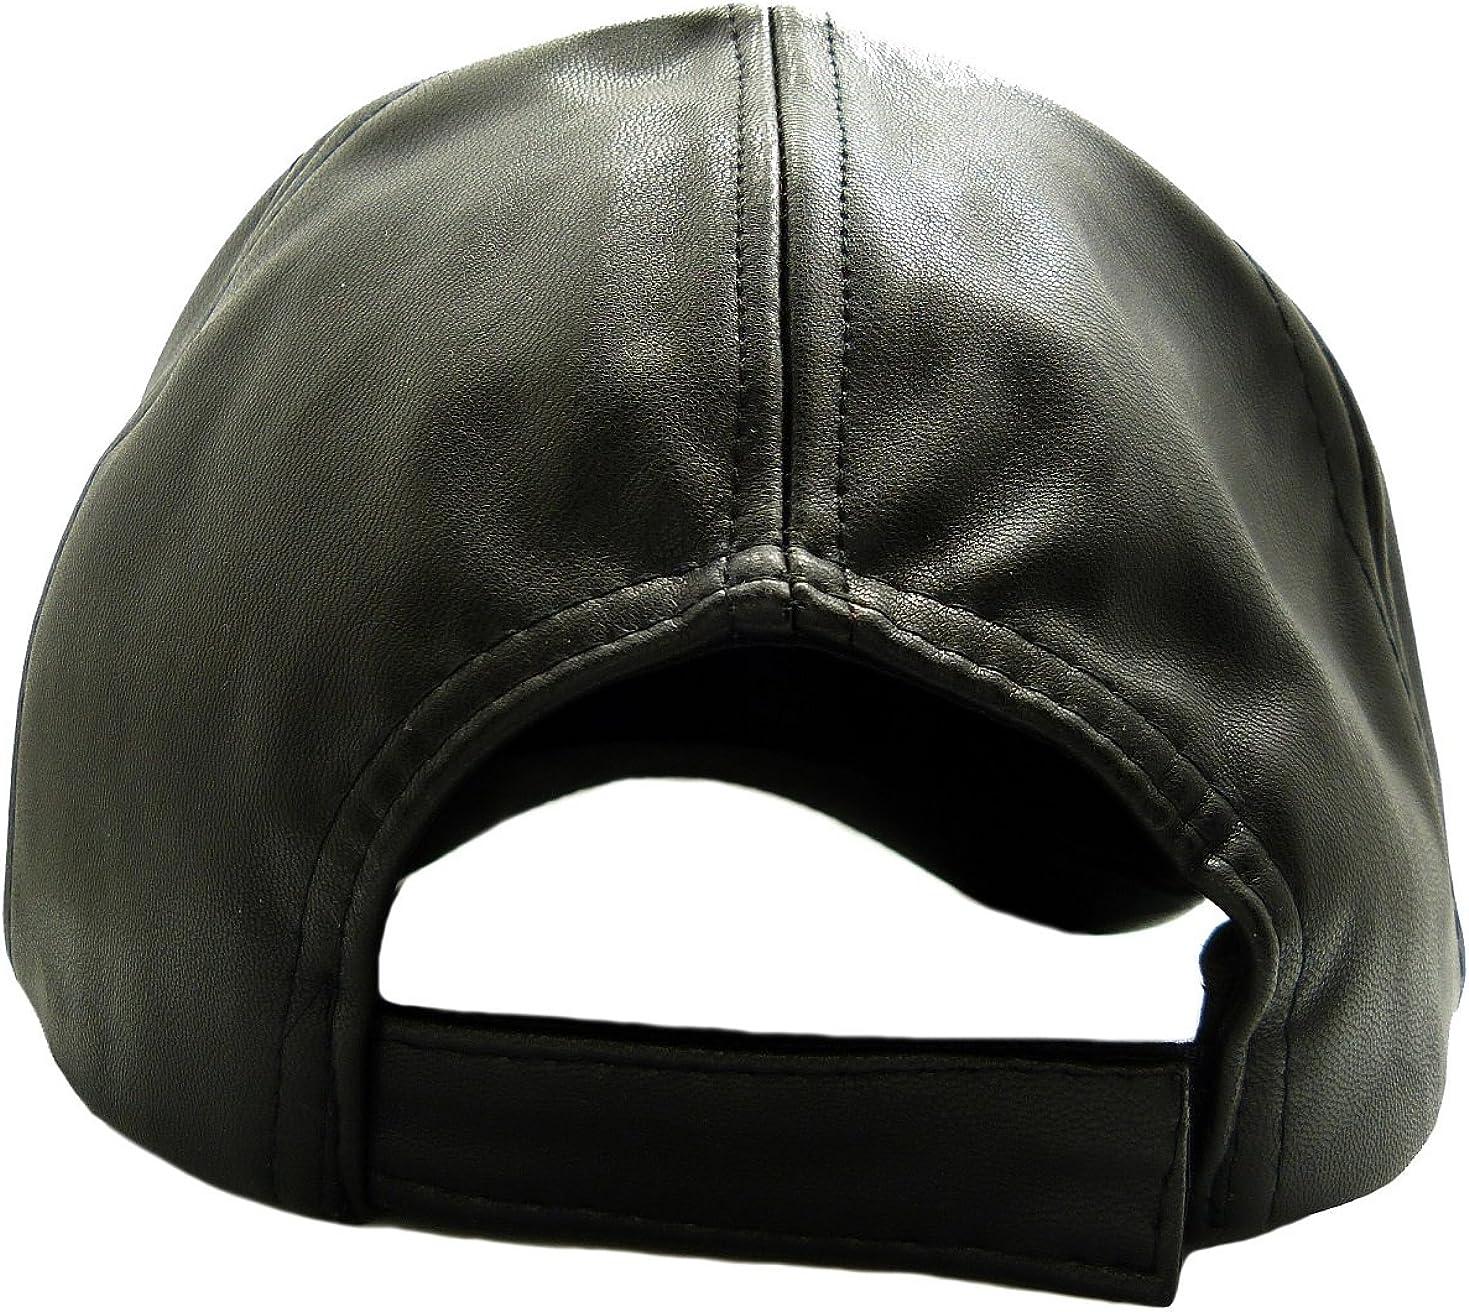 Africa Continent Plain Adjustable Cowboy Cap Denim Hat for Women and Men